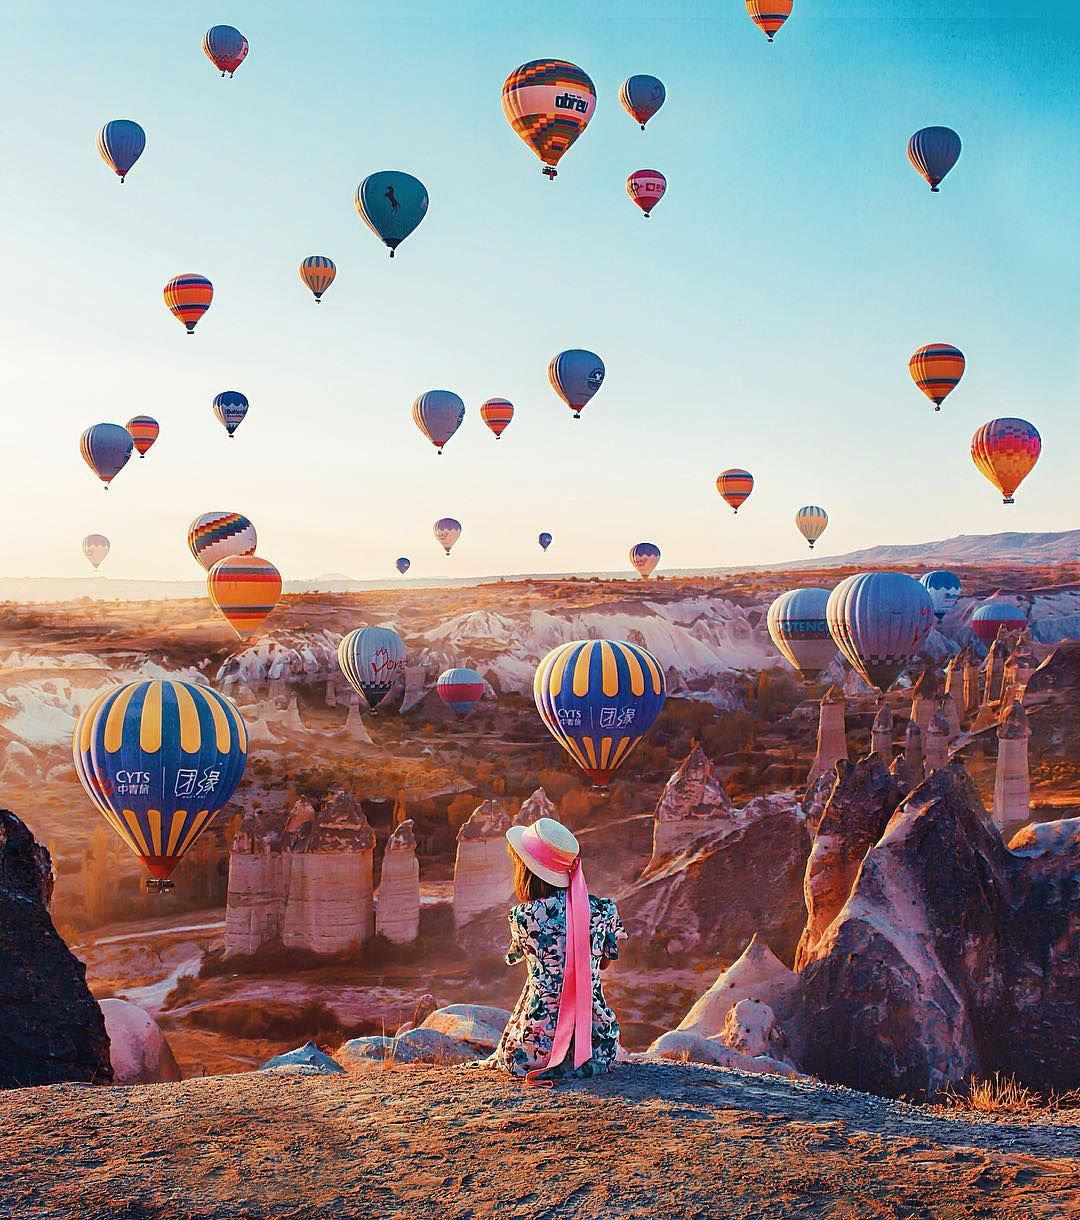 Turkish Region Cappadocia Looks Almost Too Good to be Real